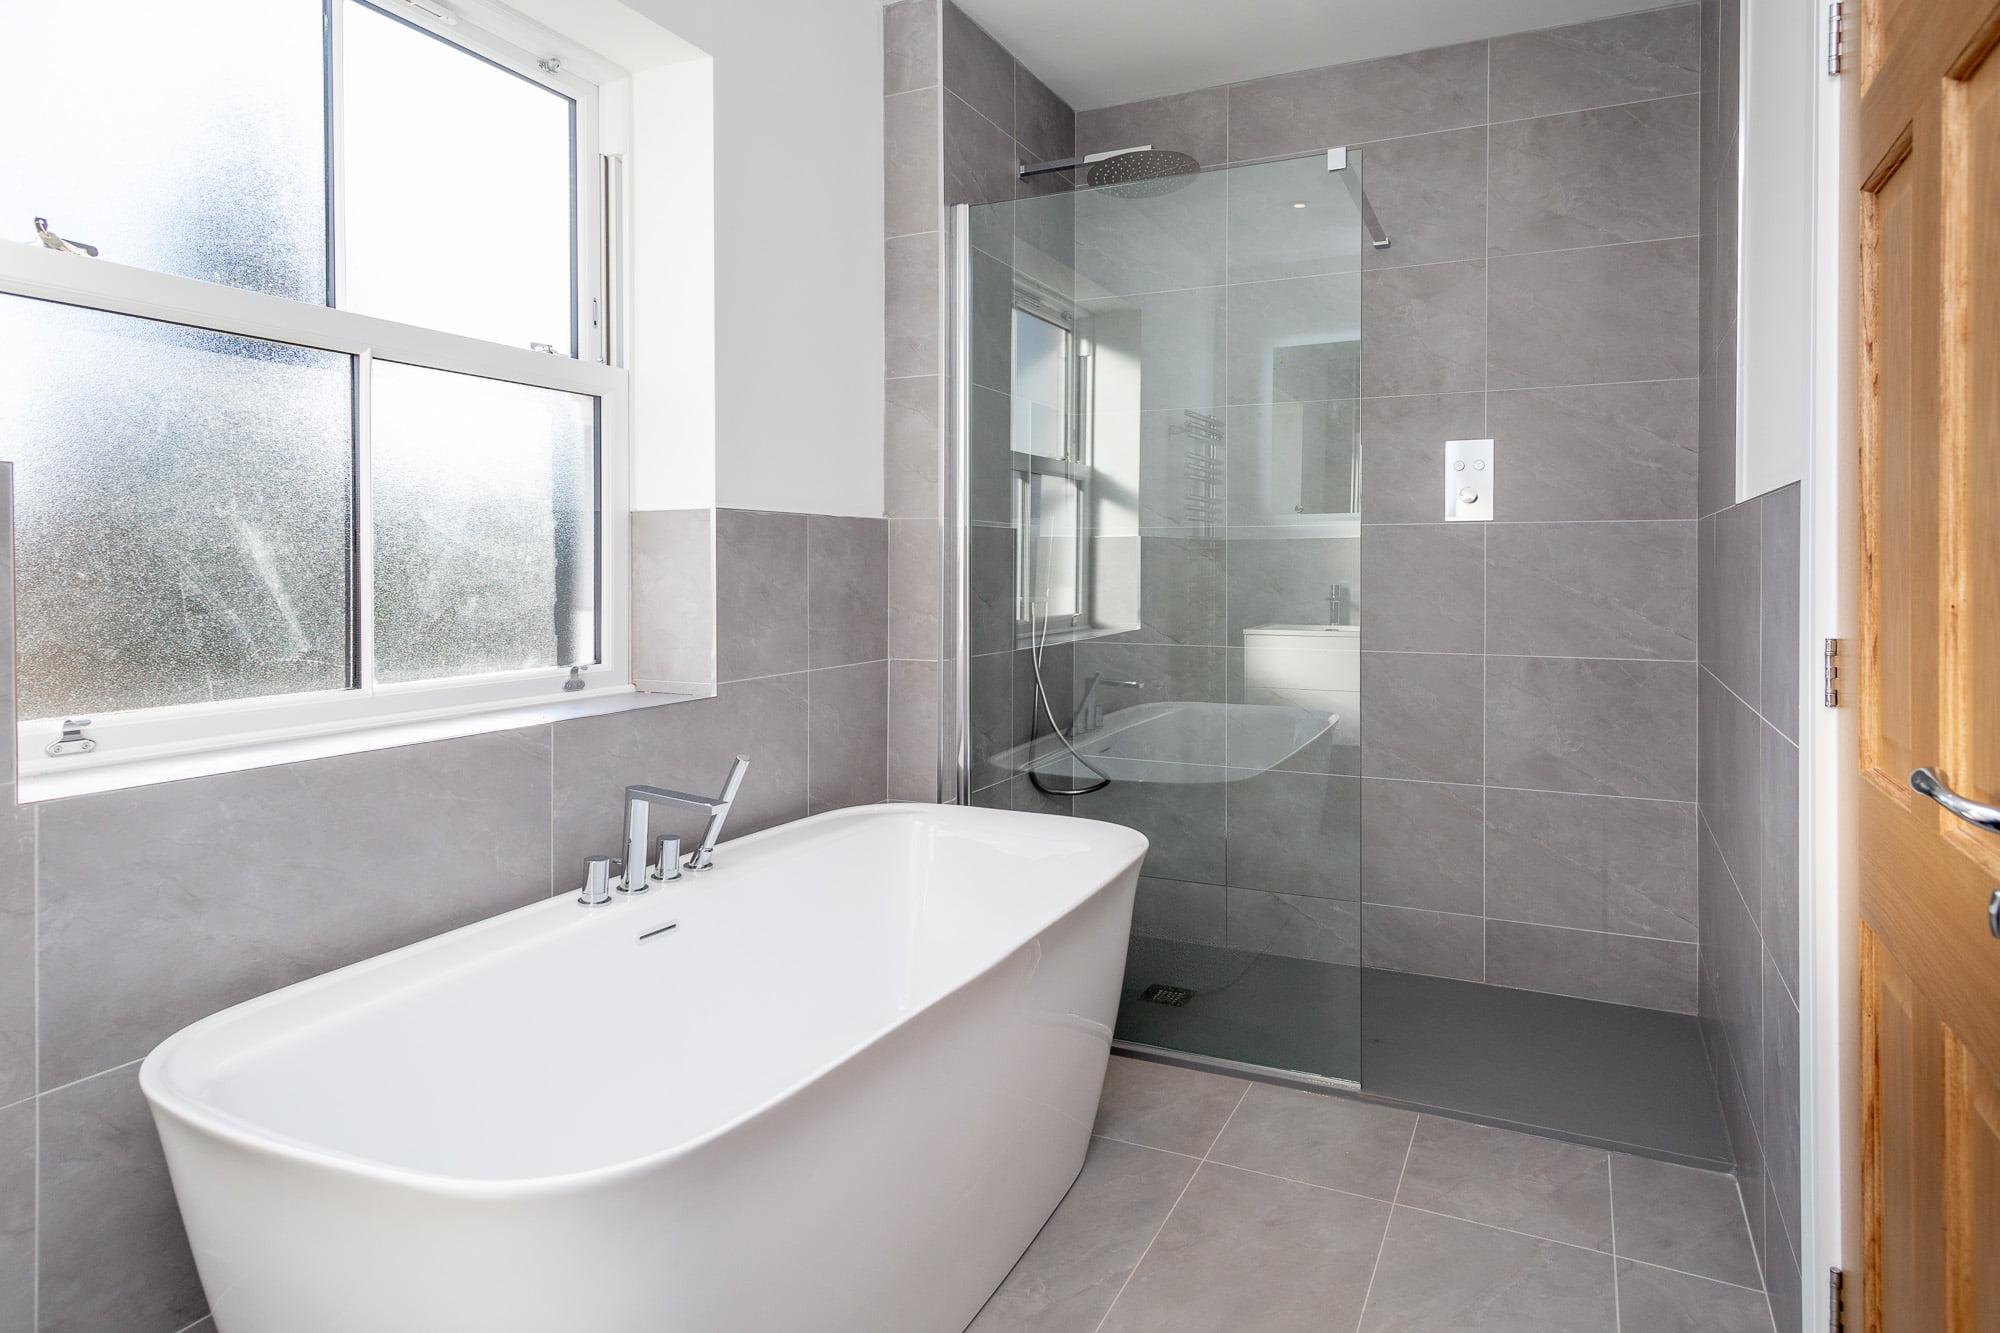 House Bathroom Shower